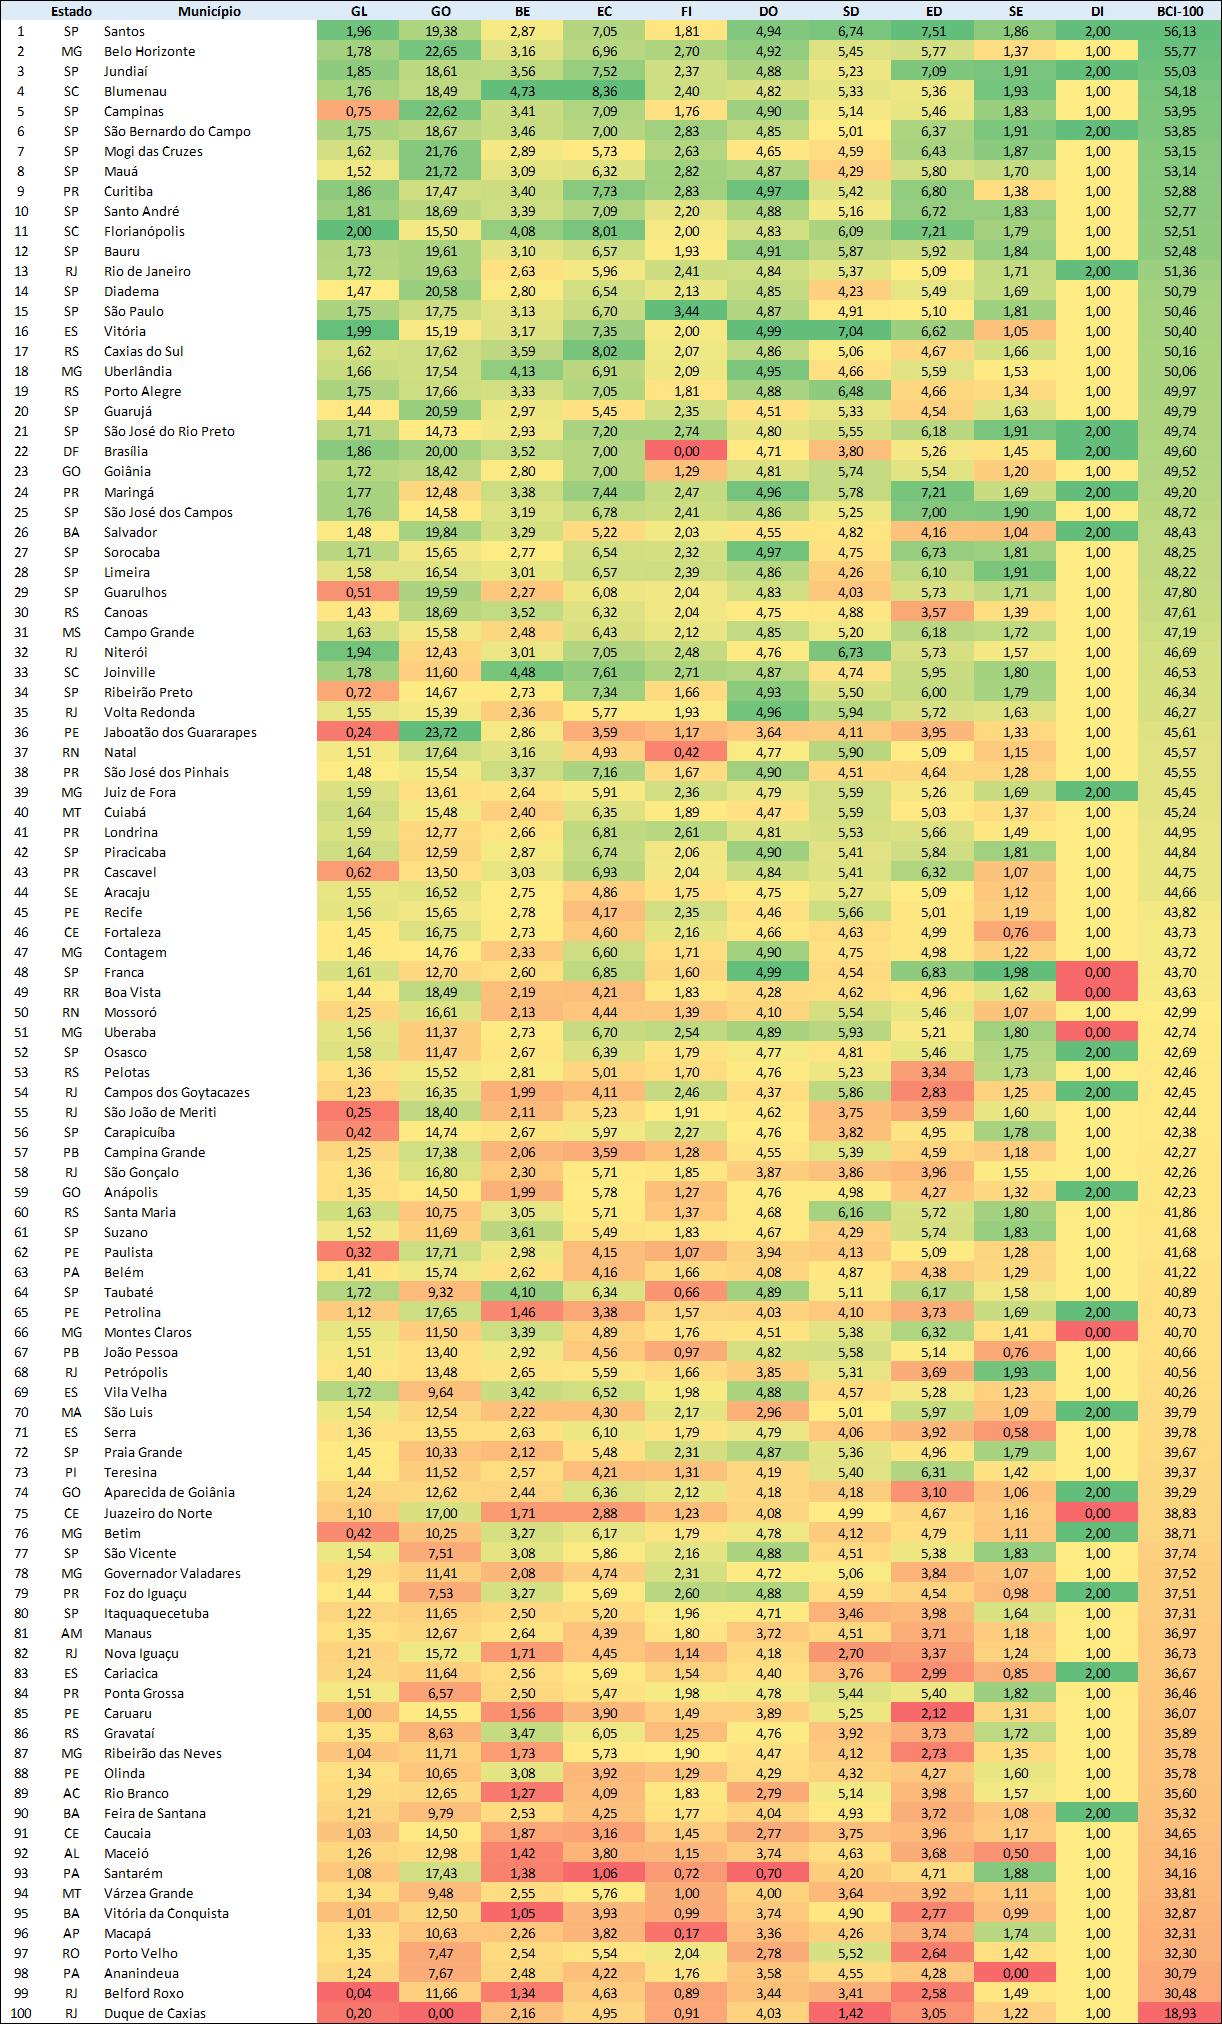 Delta Rankings/Reprodução